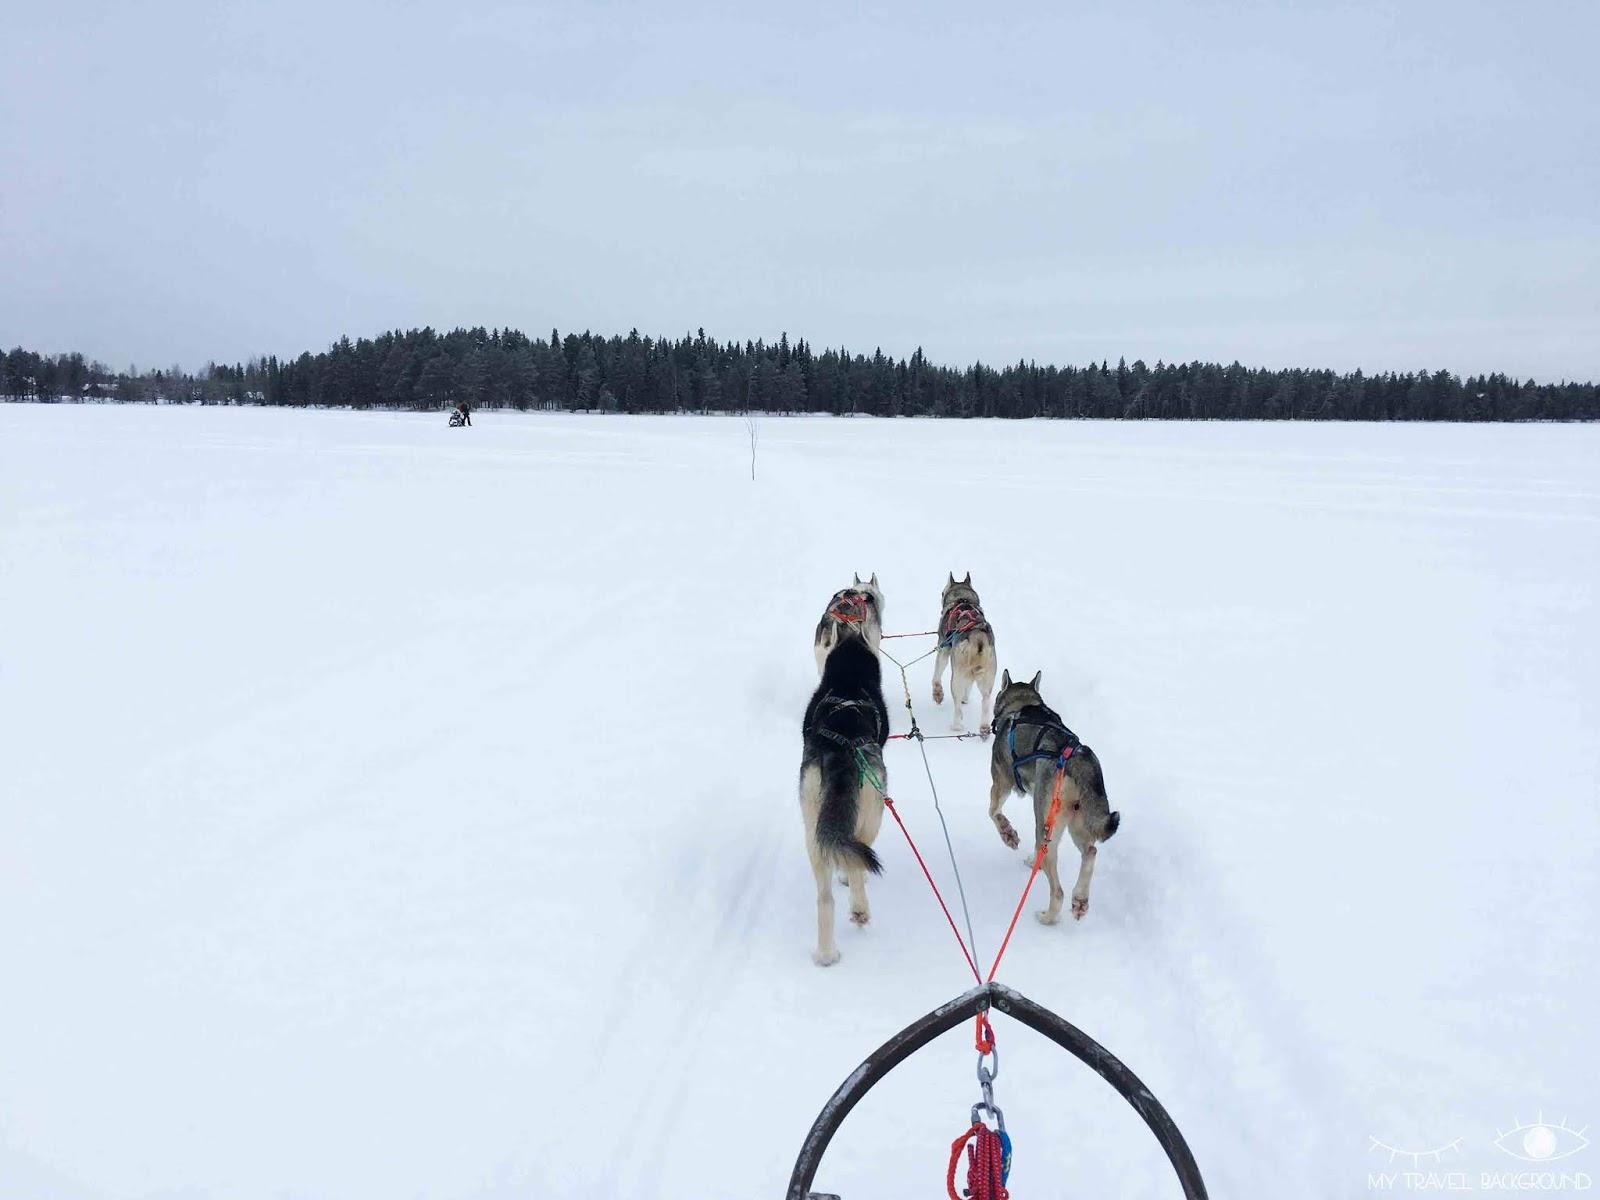 My Travel Background : carte postale de Finlande - Laponie